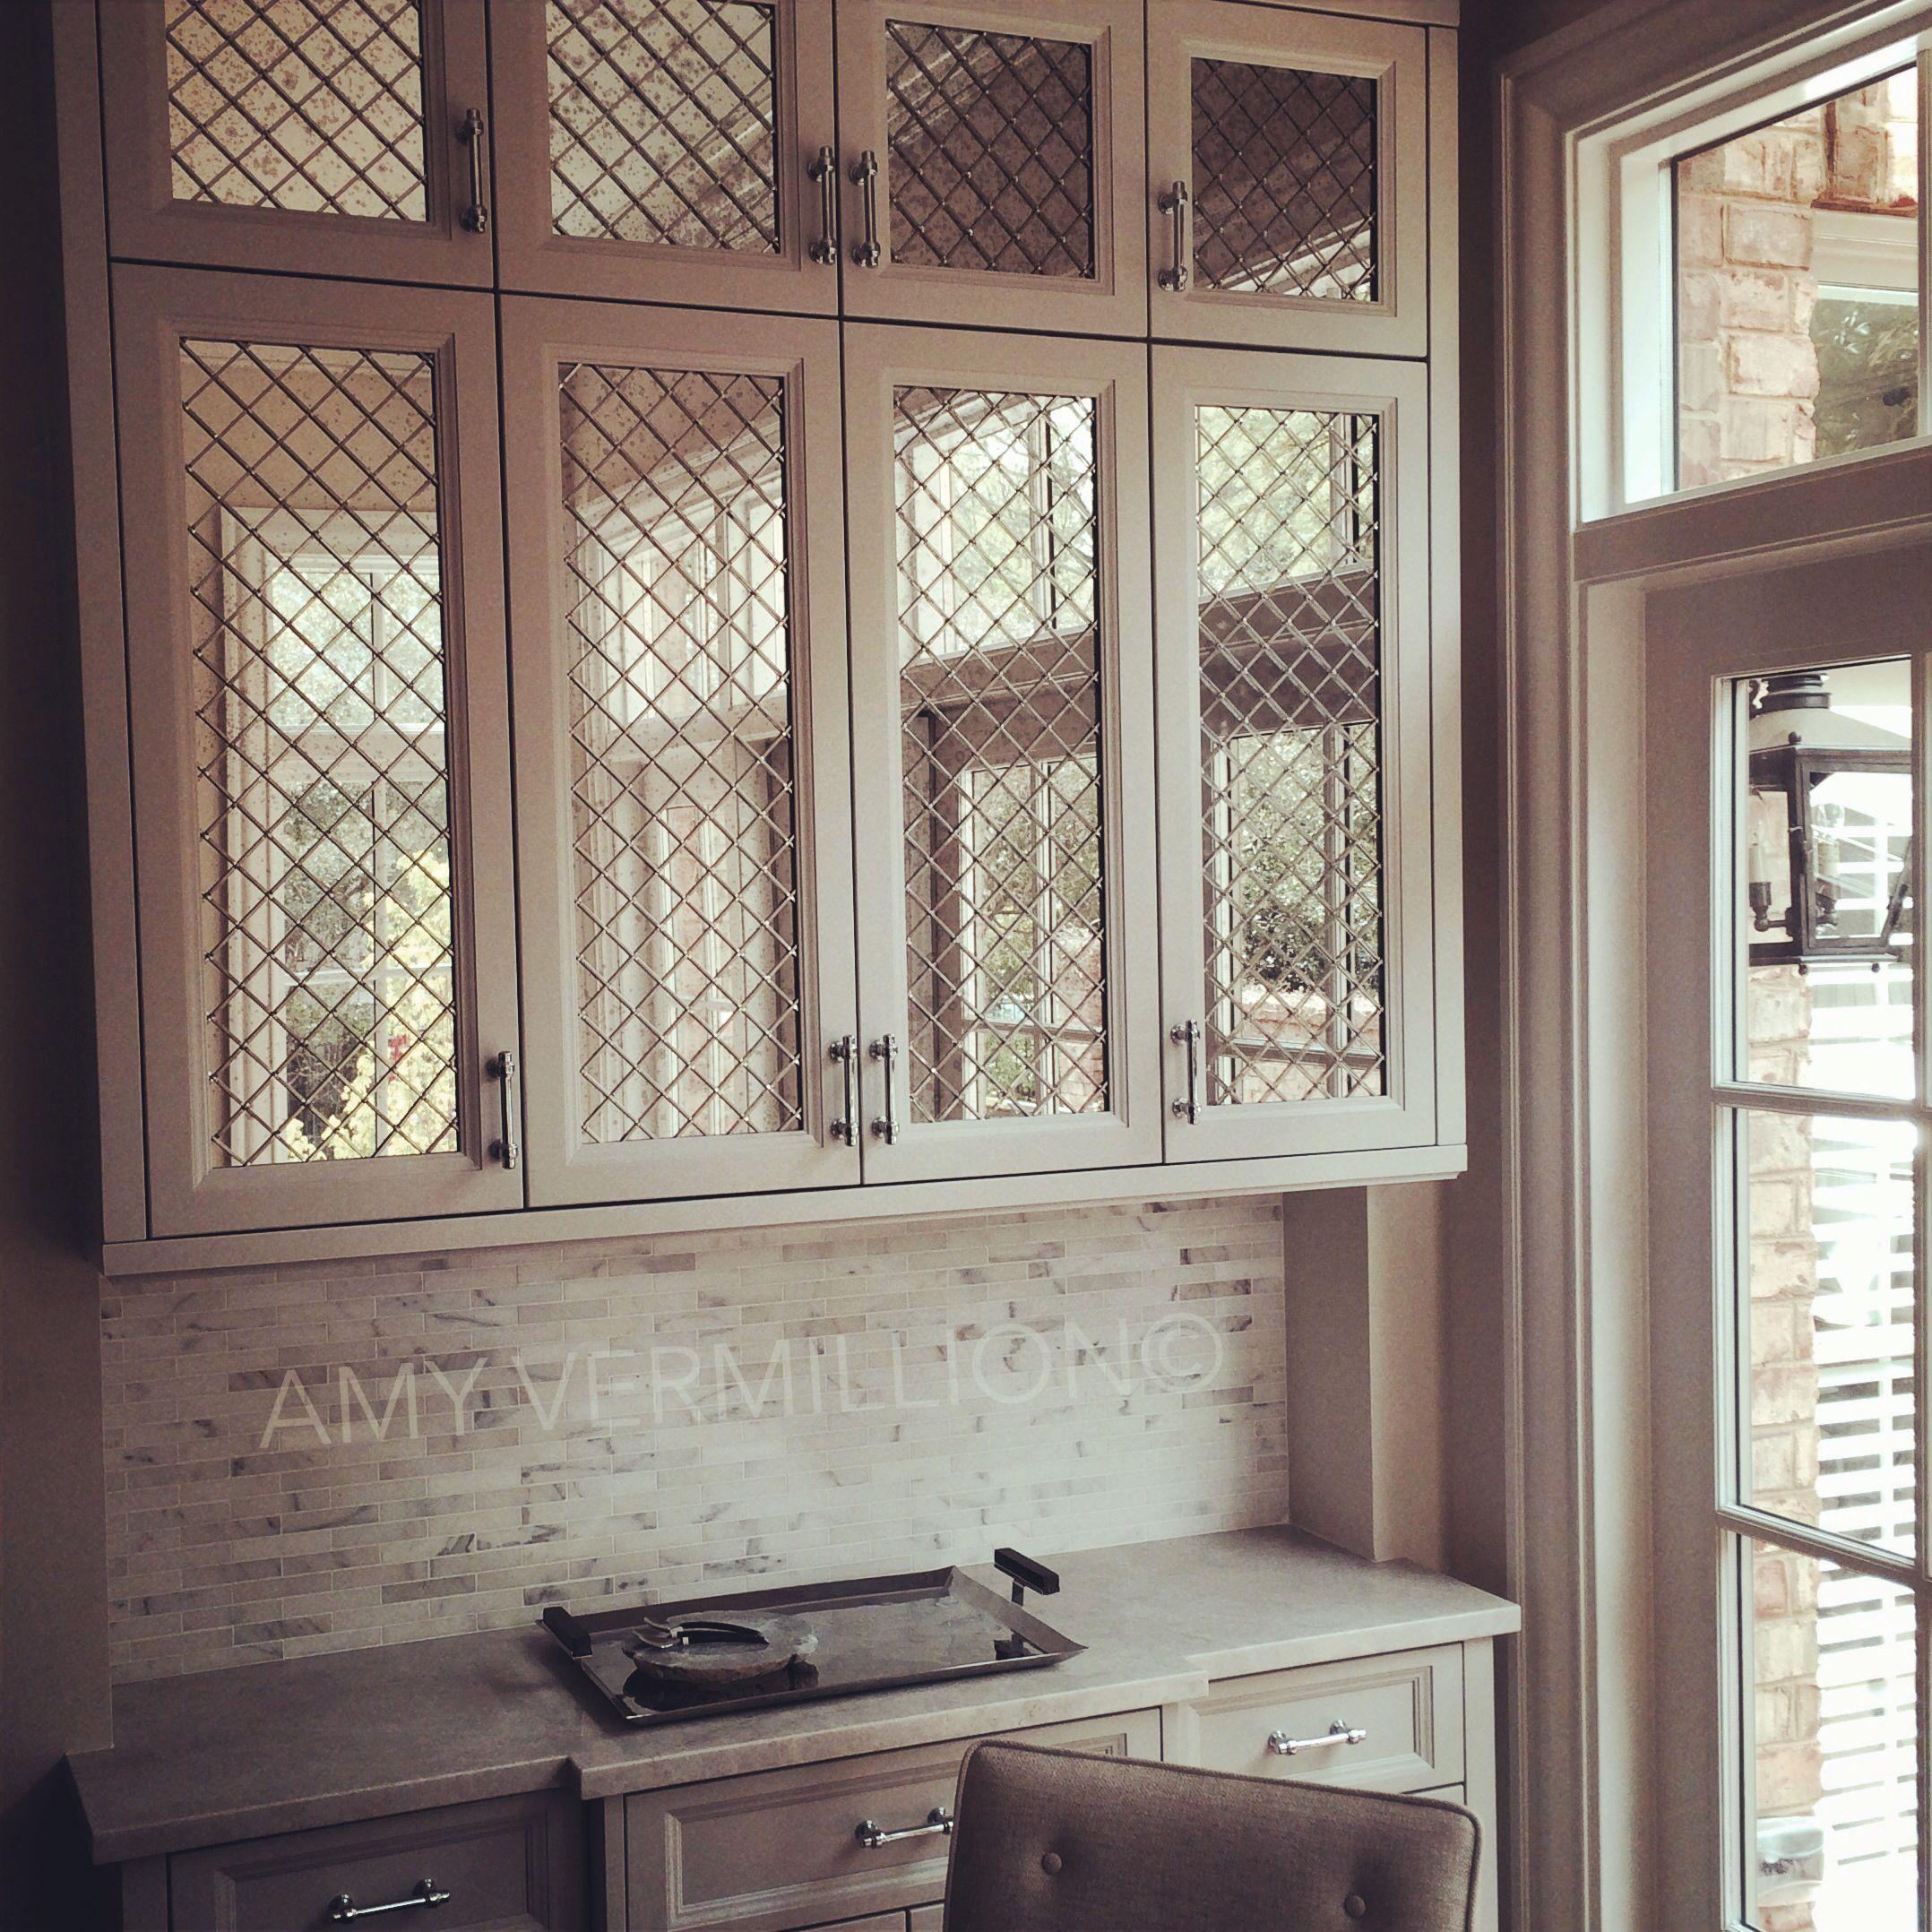 Amy vermillion interiors antique mirror behind nickel for Kitchen door with window